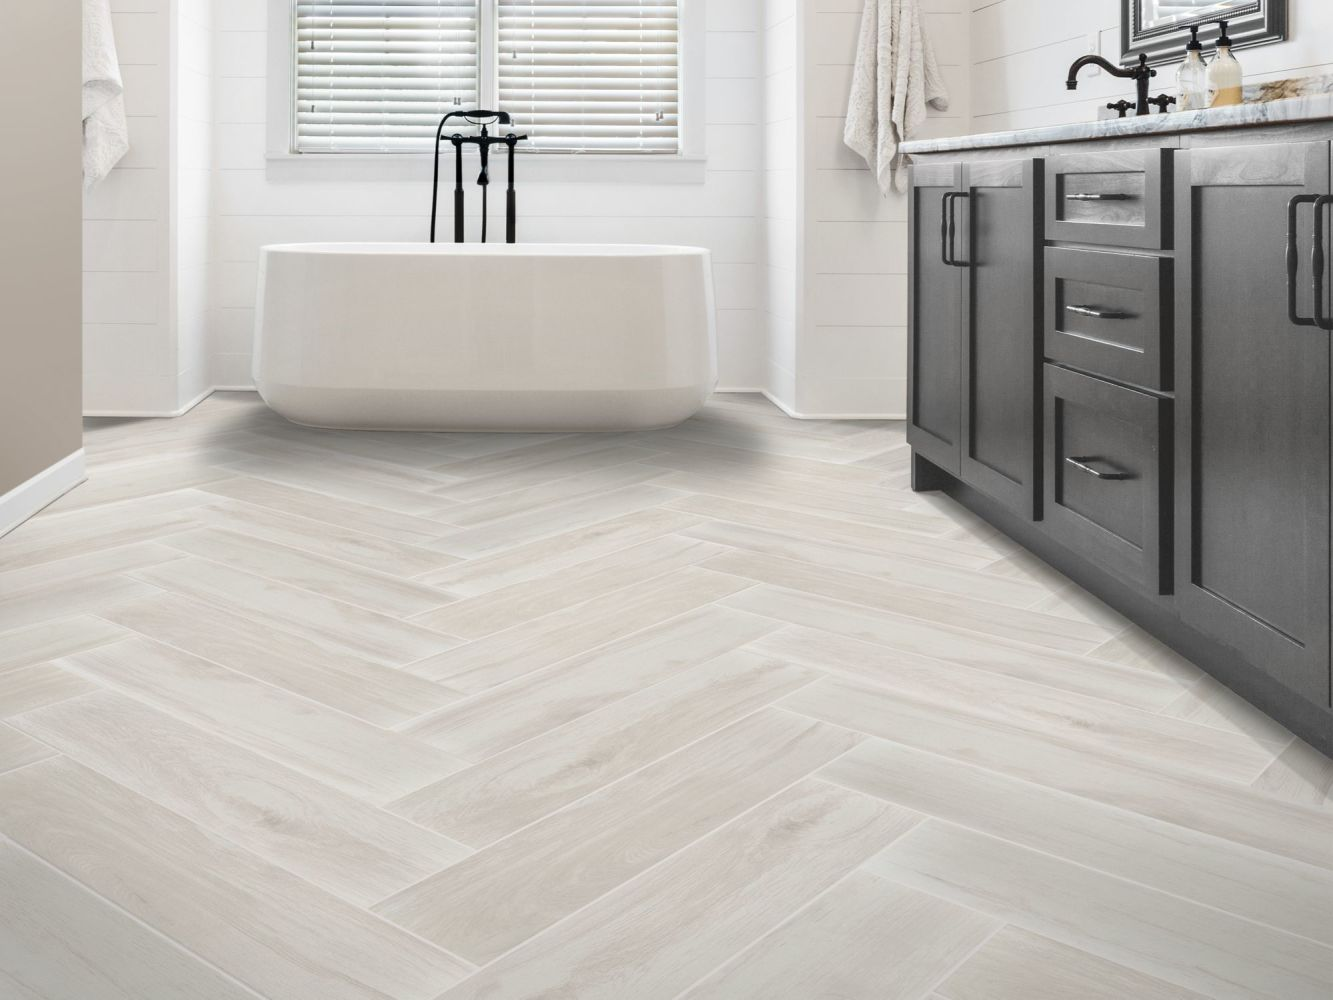 Shaw Floors Ceramic Solutions Regent 7×22 Snow 00100_290TS